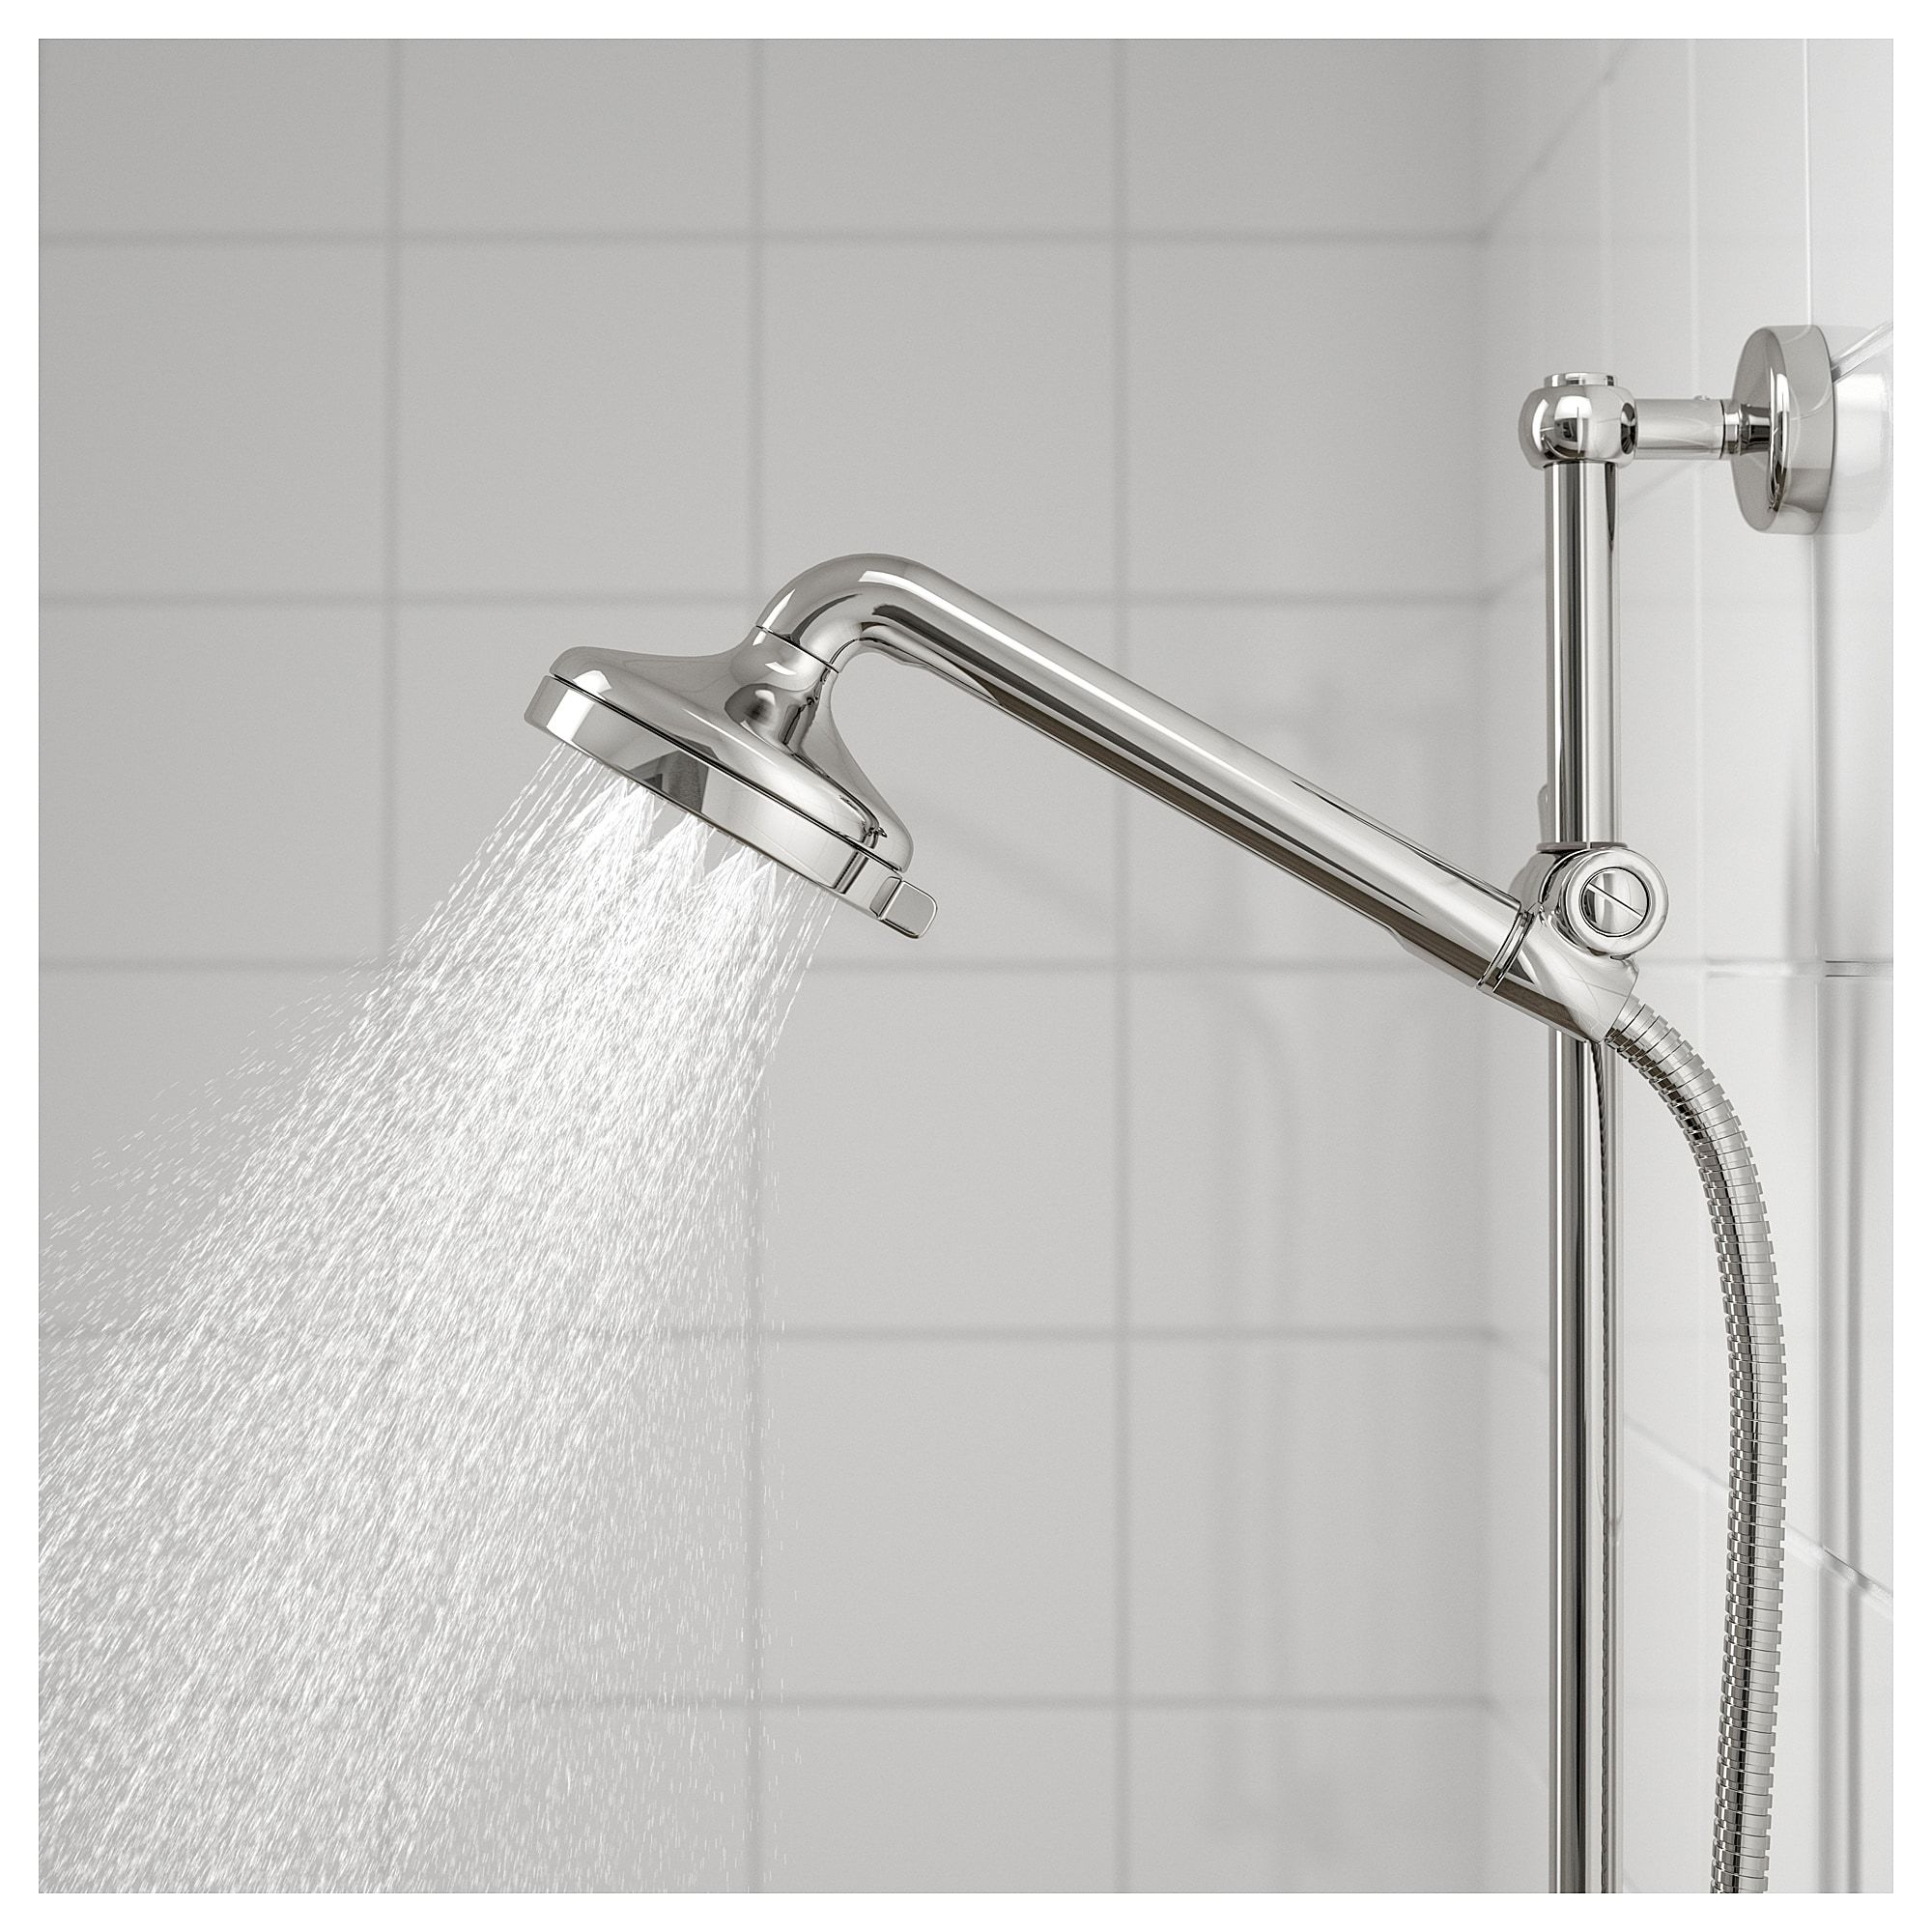 VOXNAN 5spray hand shower chrome plated Hand shower